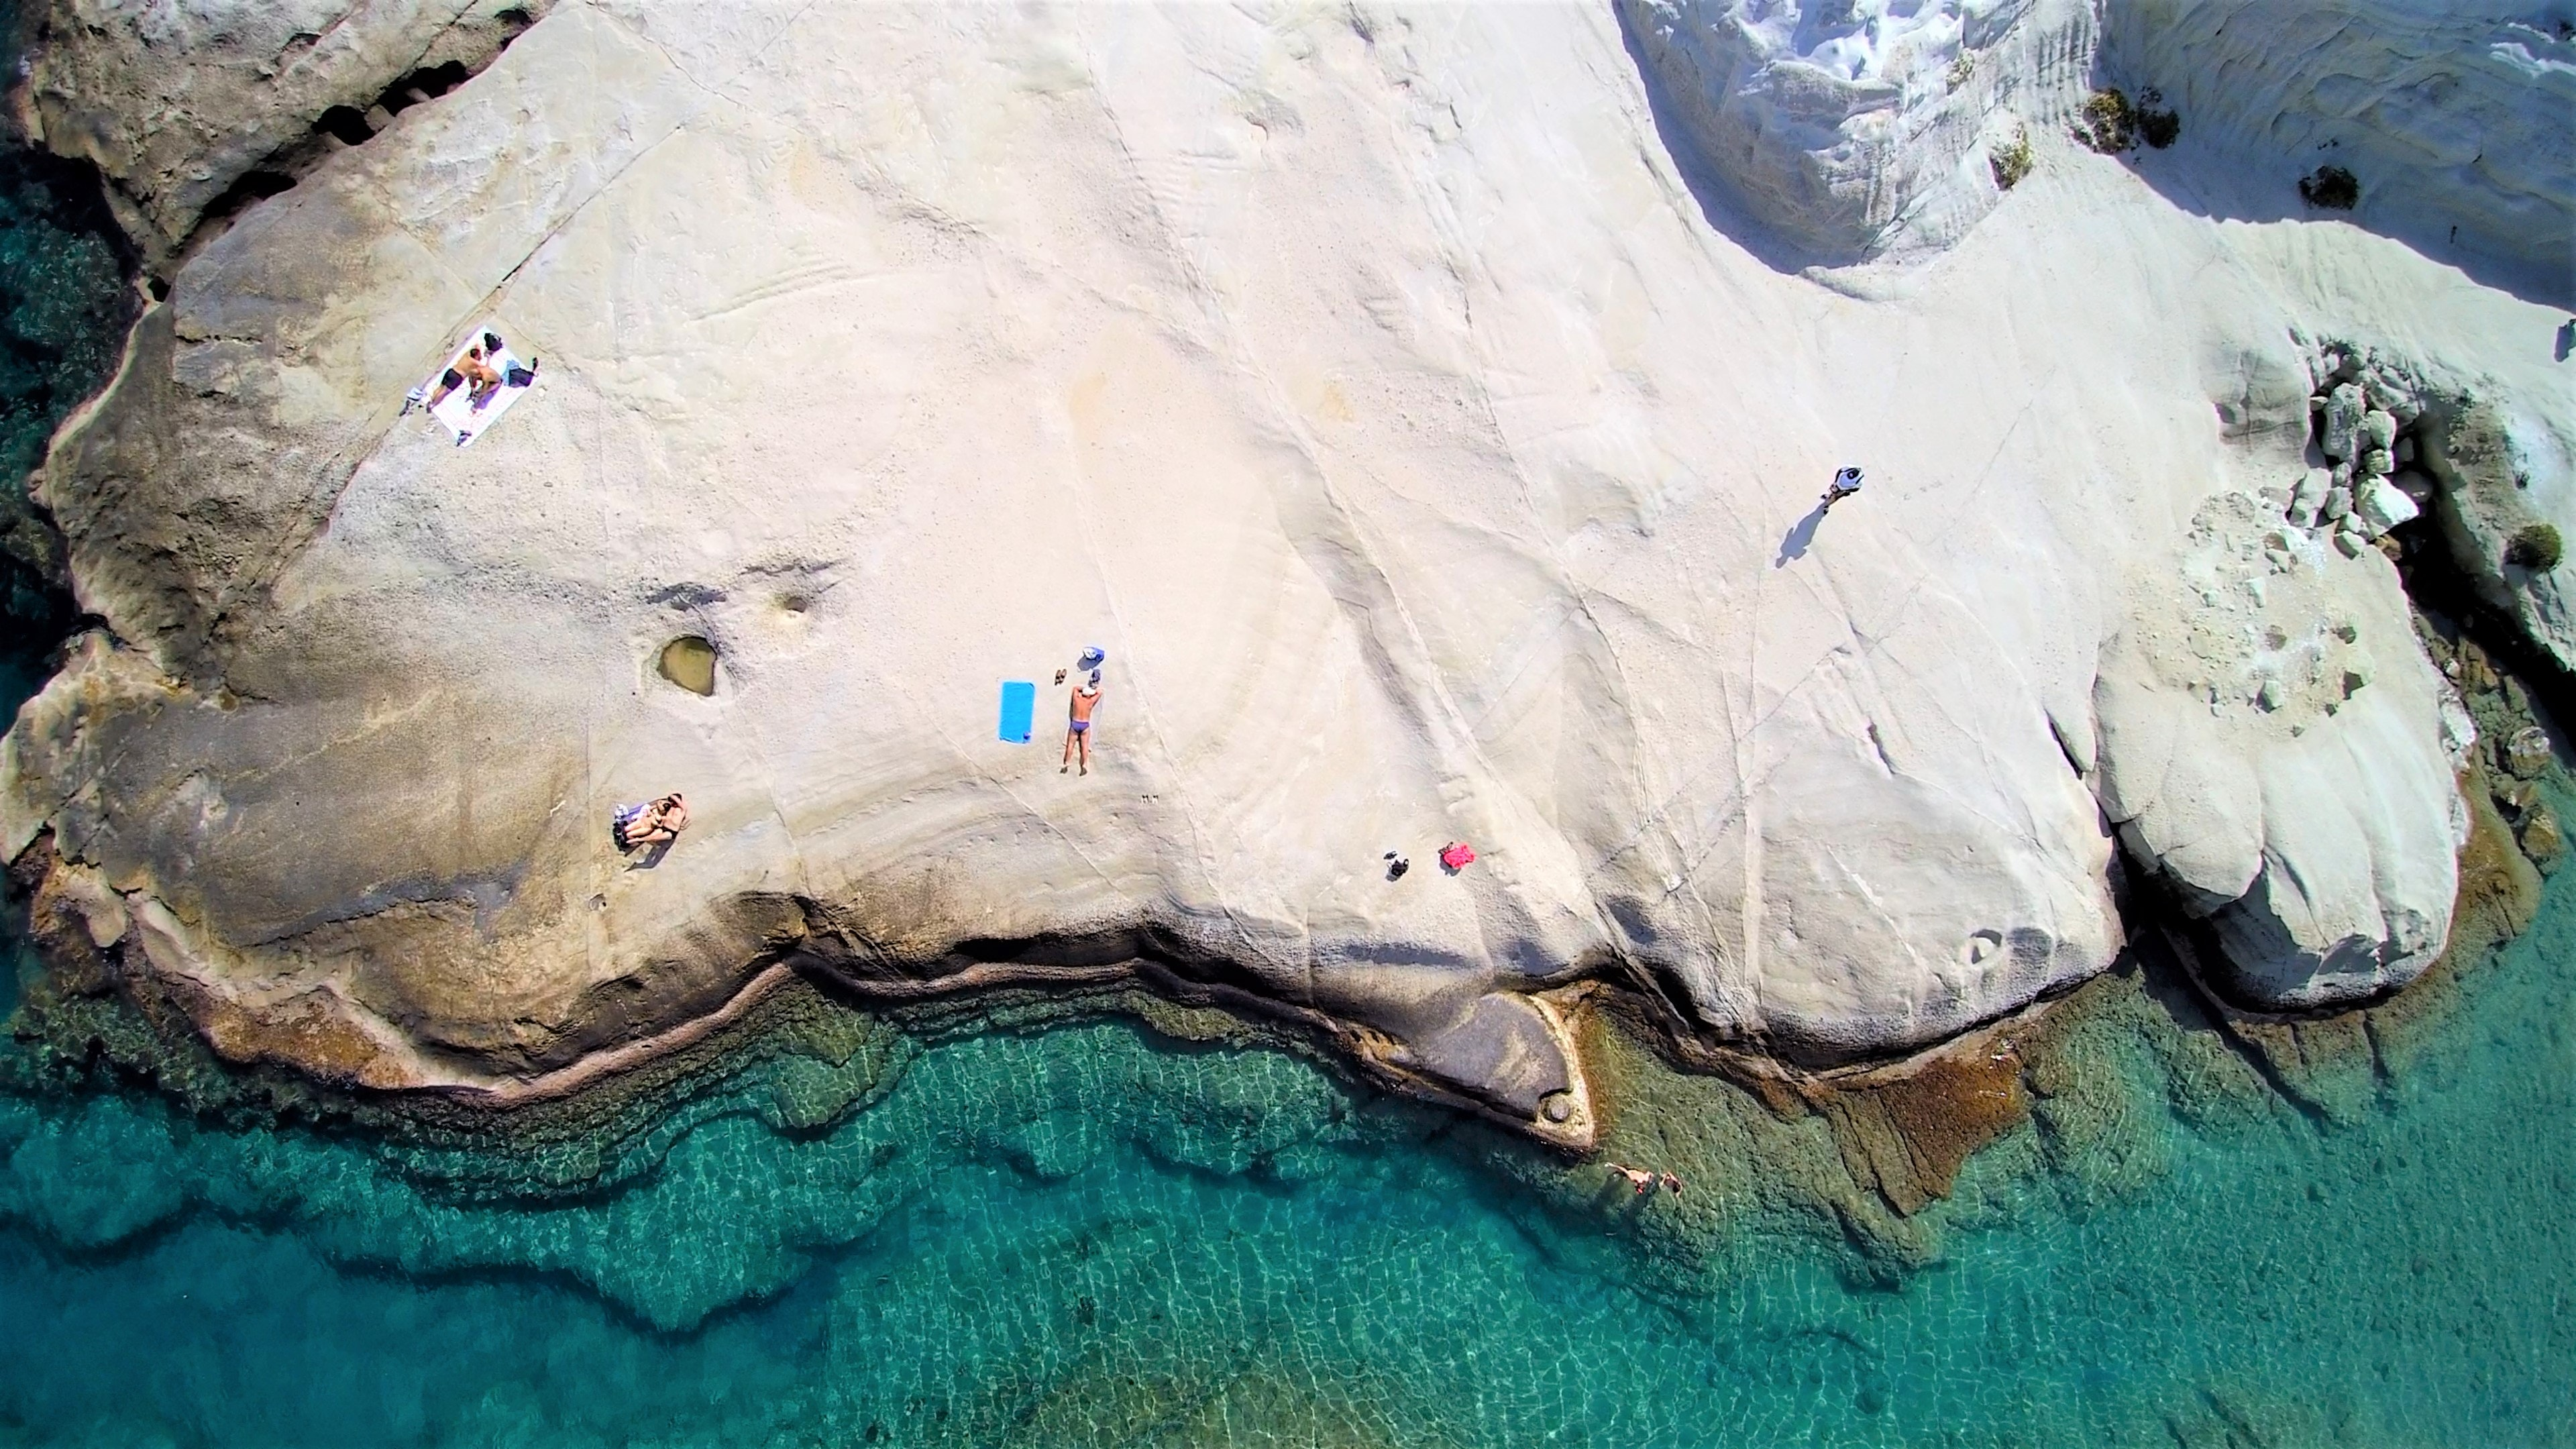 Skiathos, Greece, Full Shot of Vitamin Sea